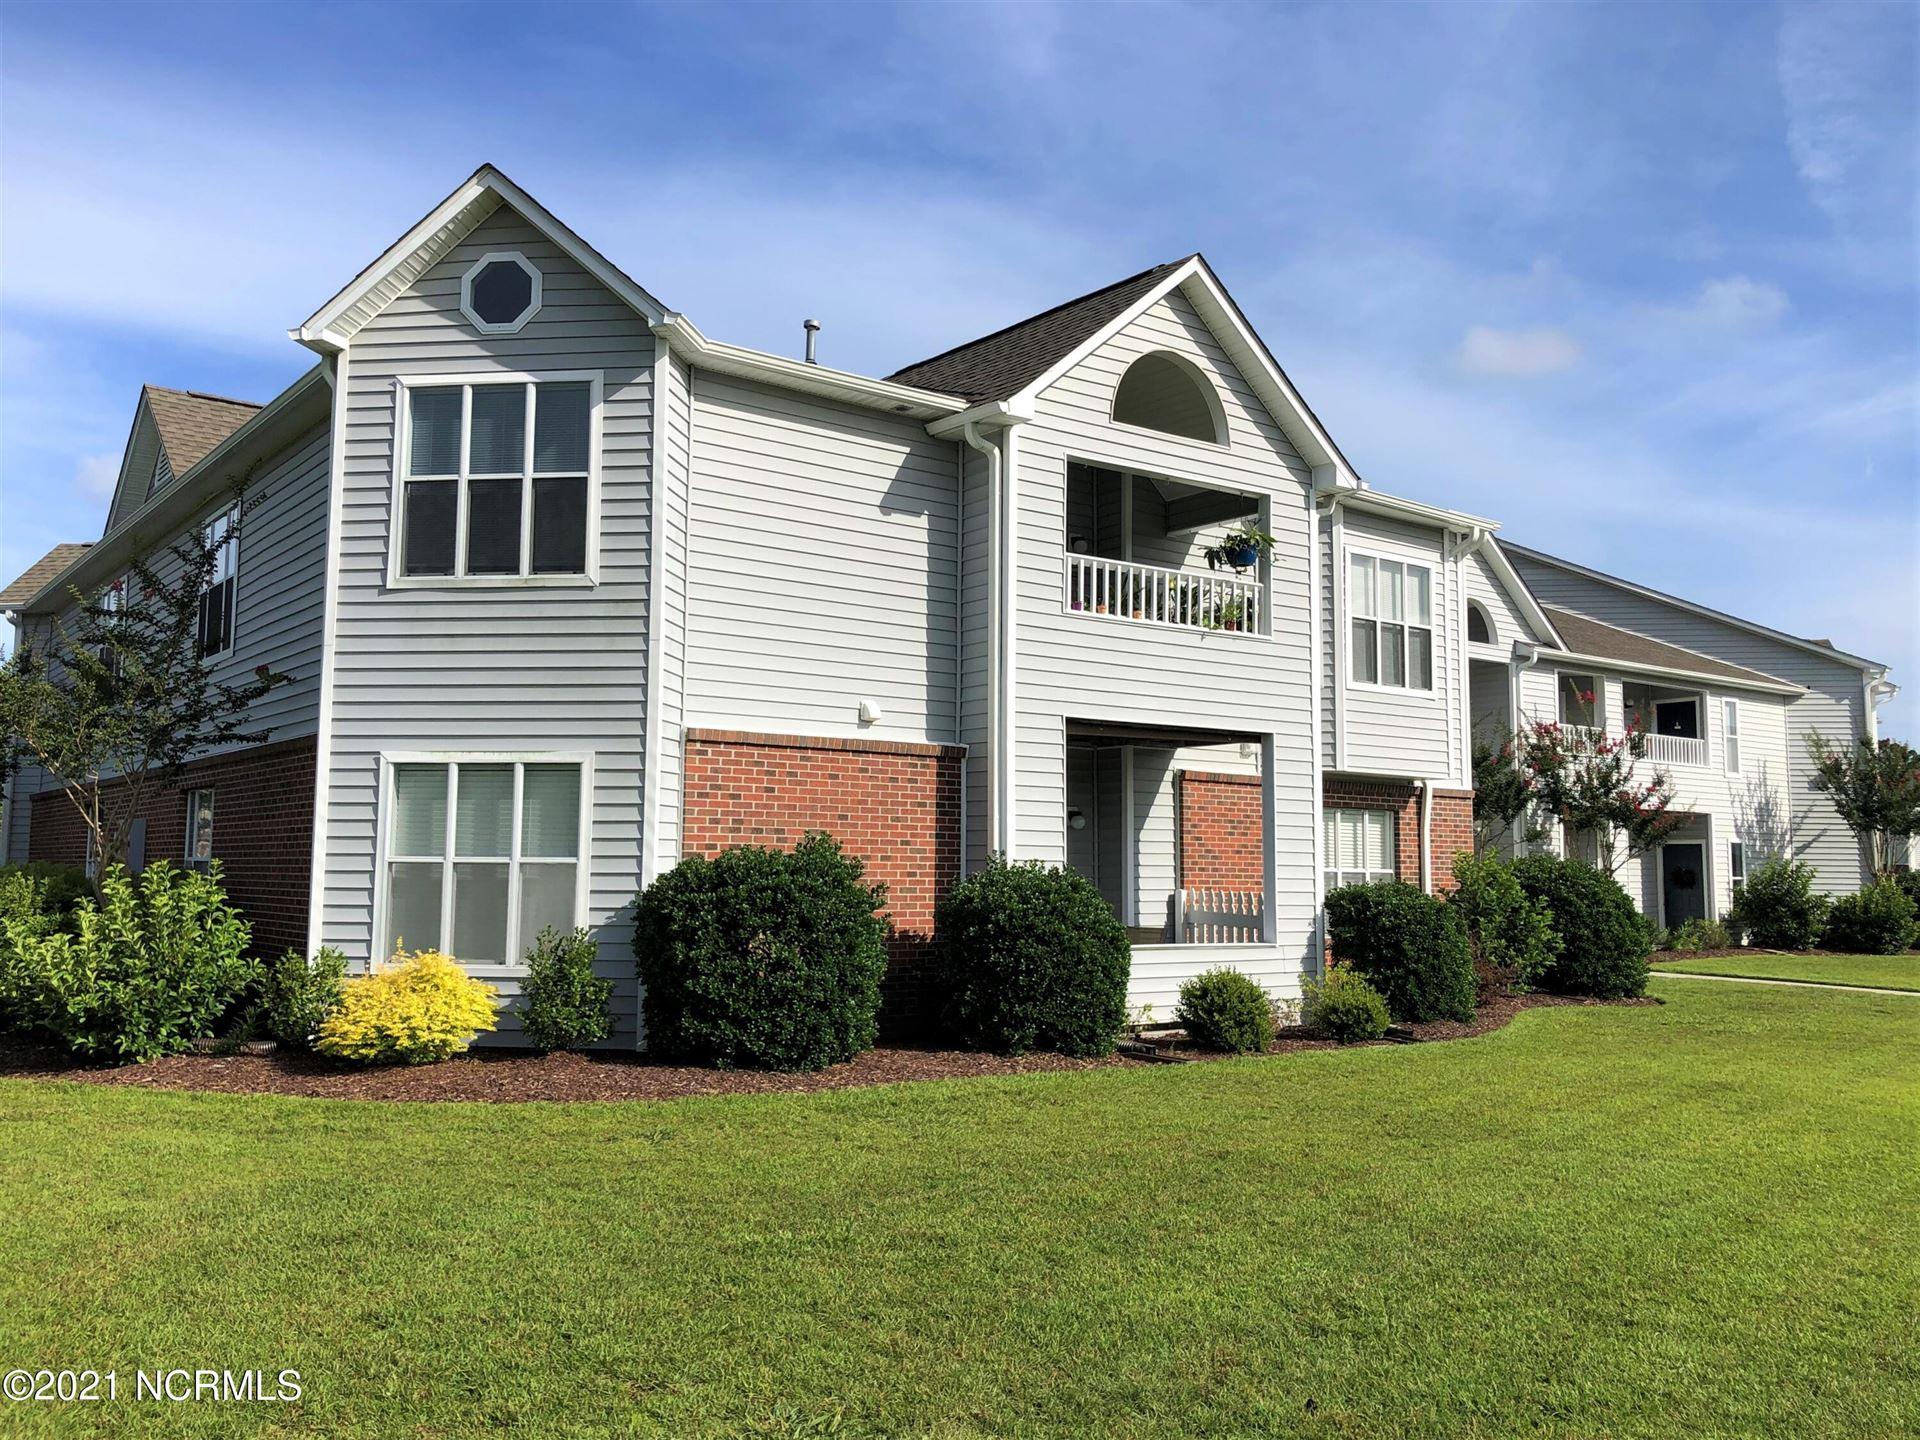 Photo for 4148 Breezewood Drive #204, Wilmington, NC 28412 (MLS # 100281128)